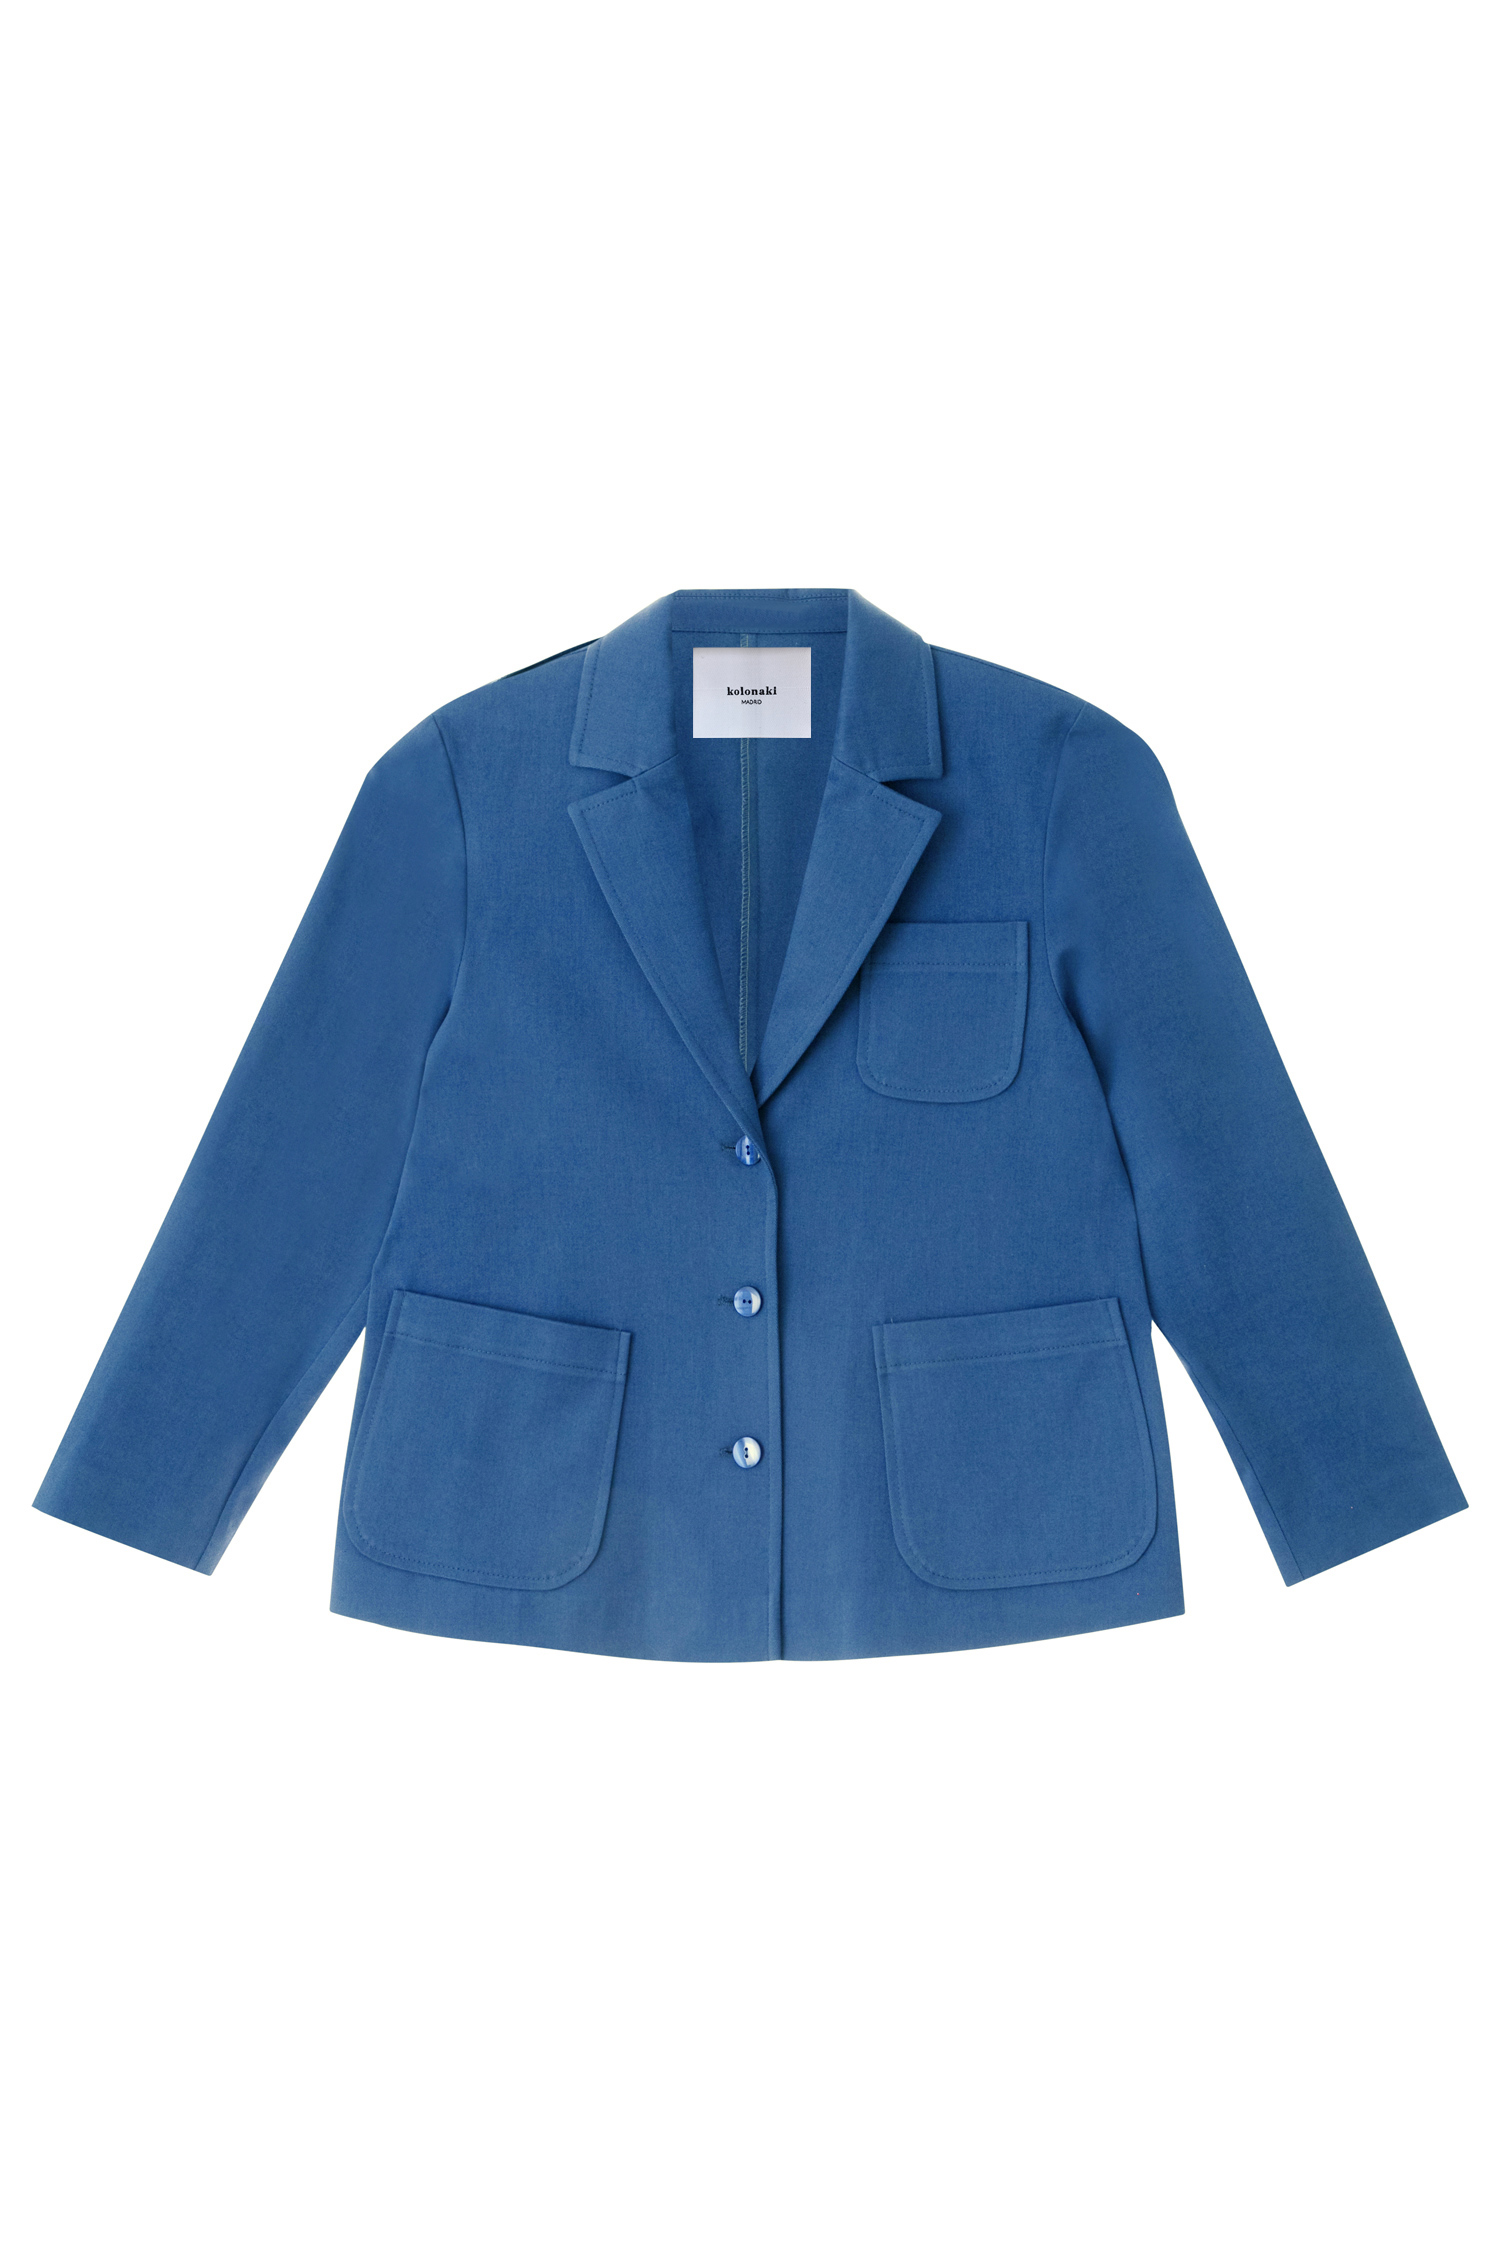 chaqueta mahon